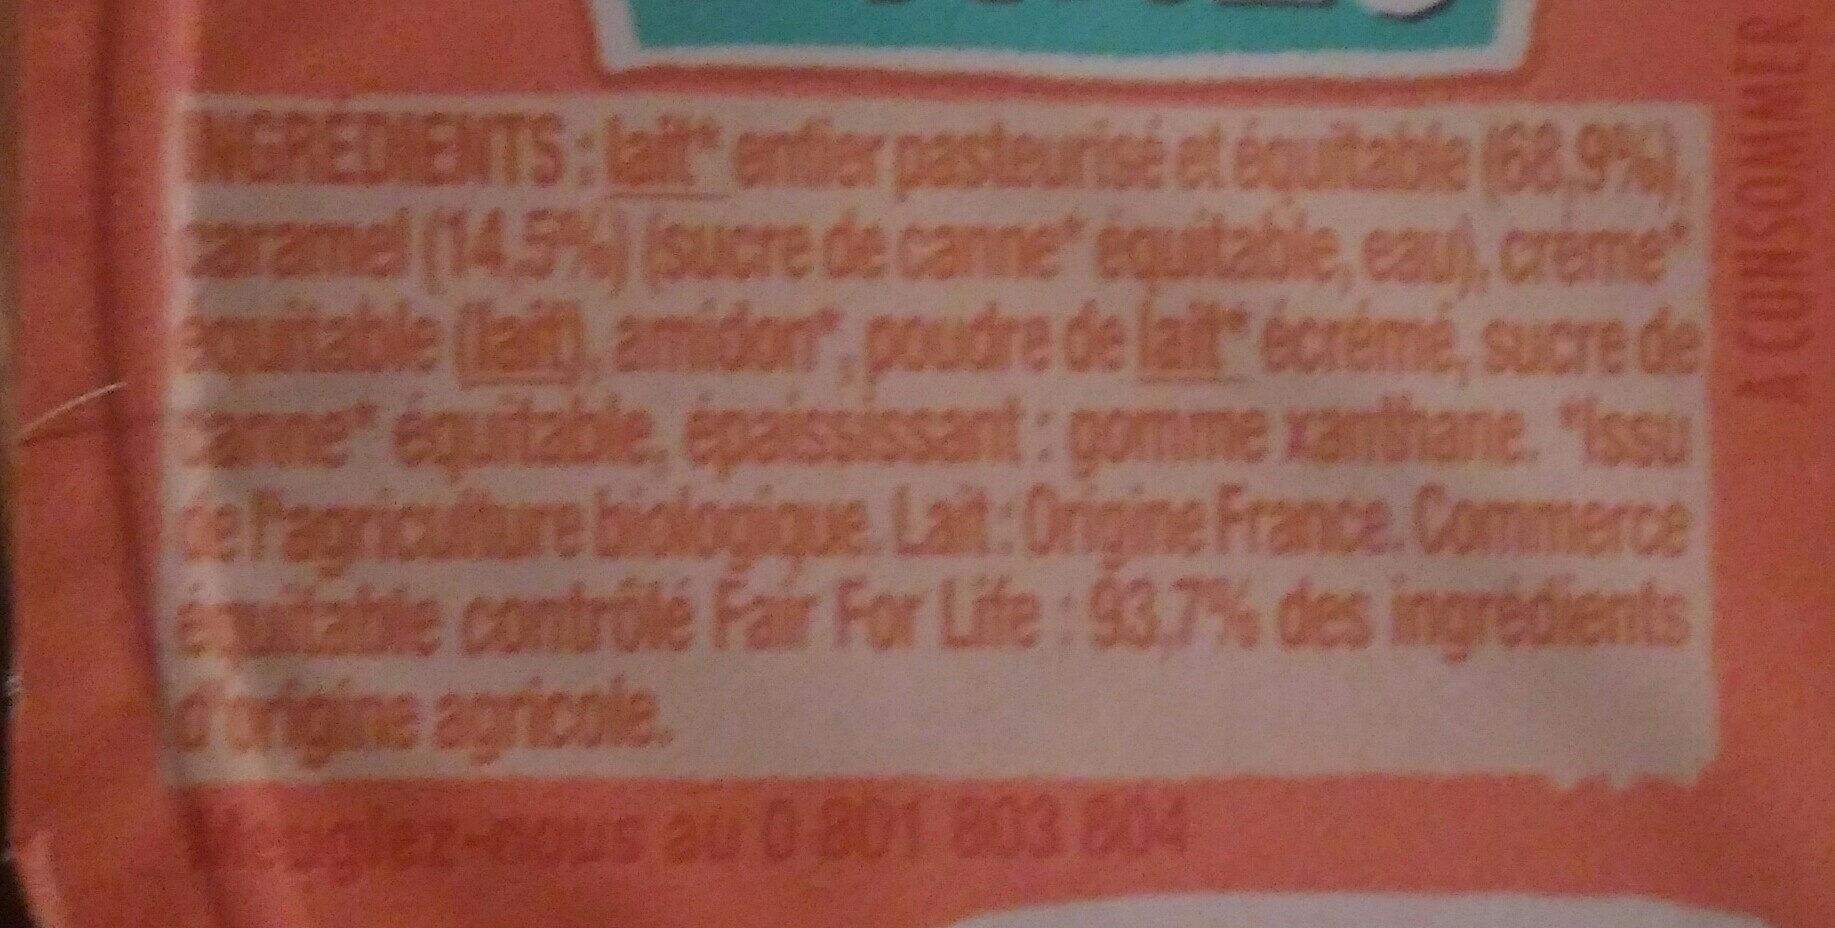 Crèmeuh caramel - Ingrediënten - fr